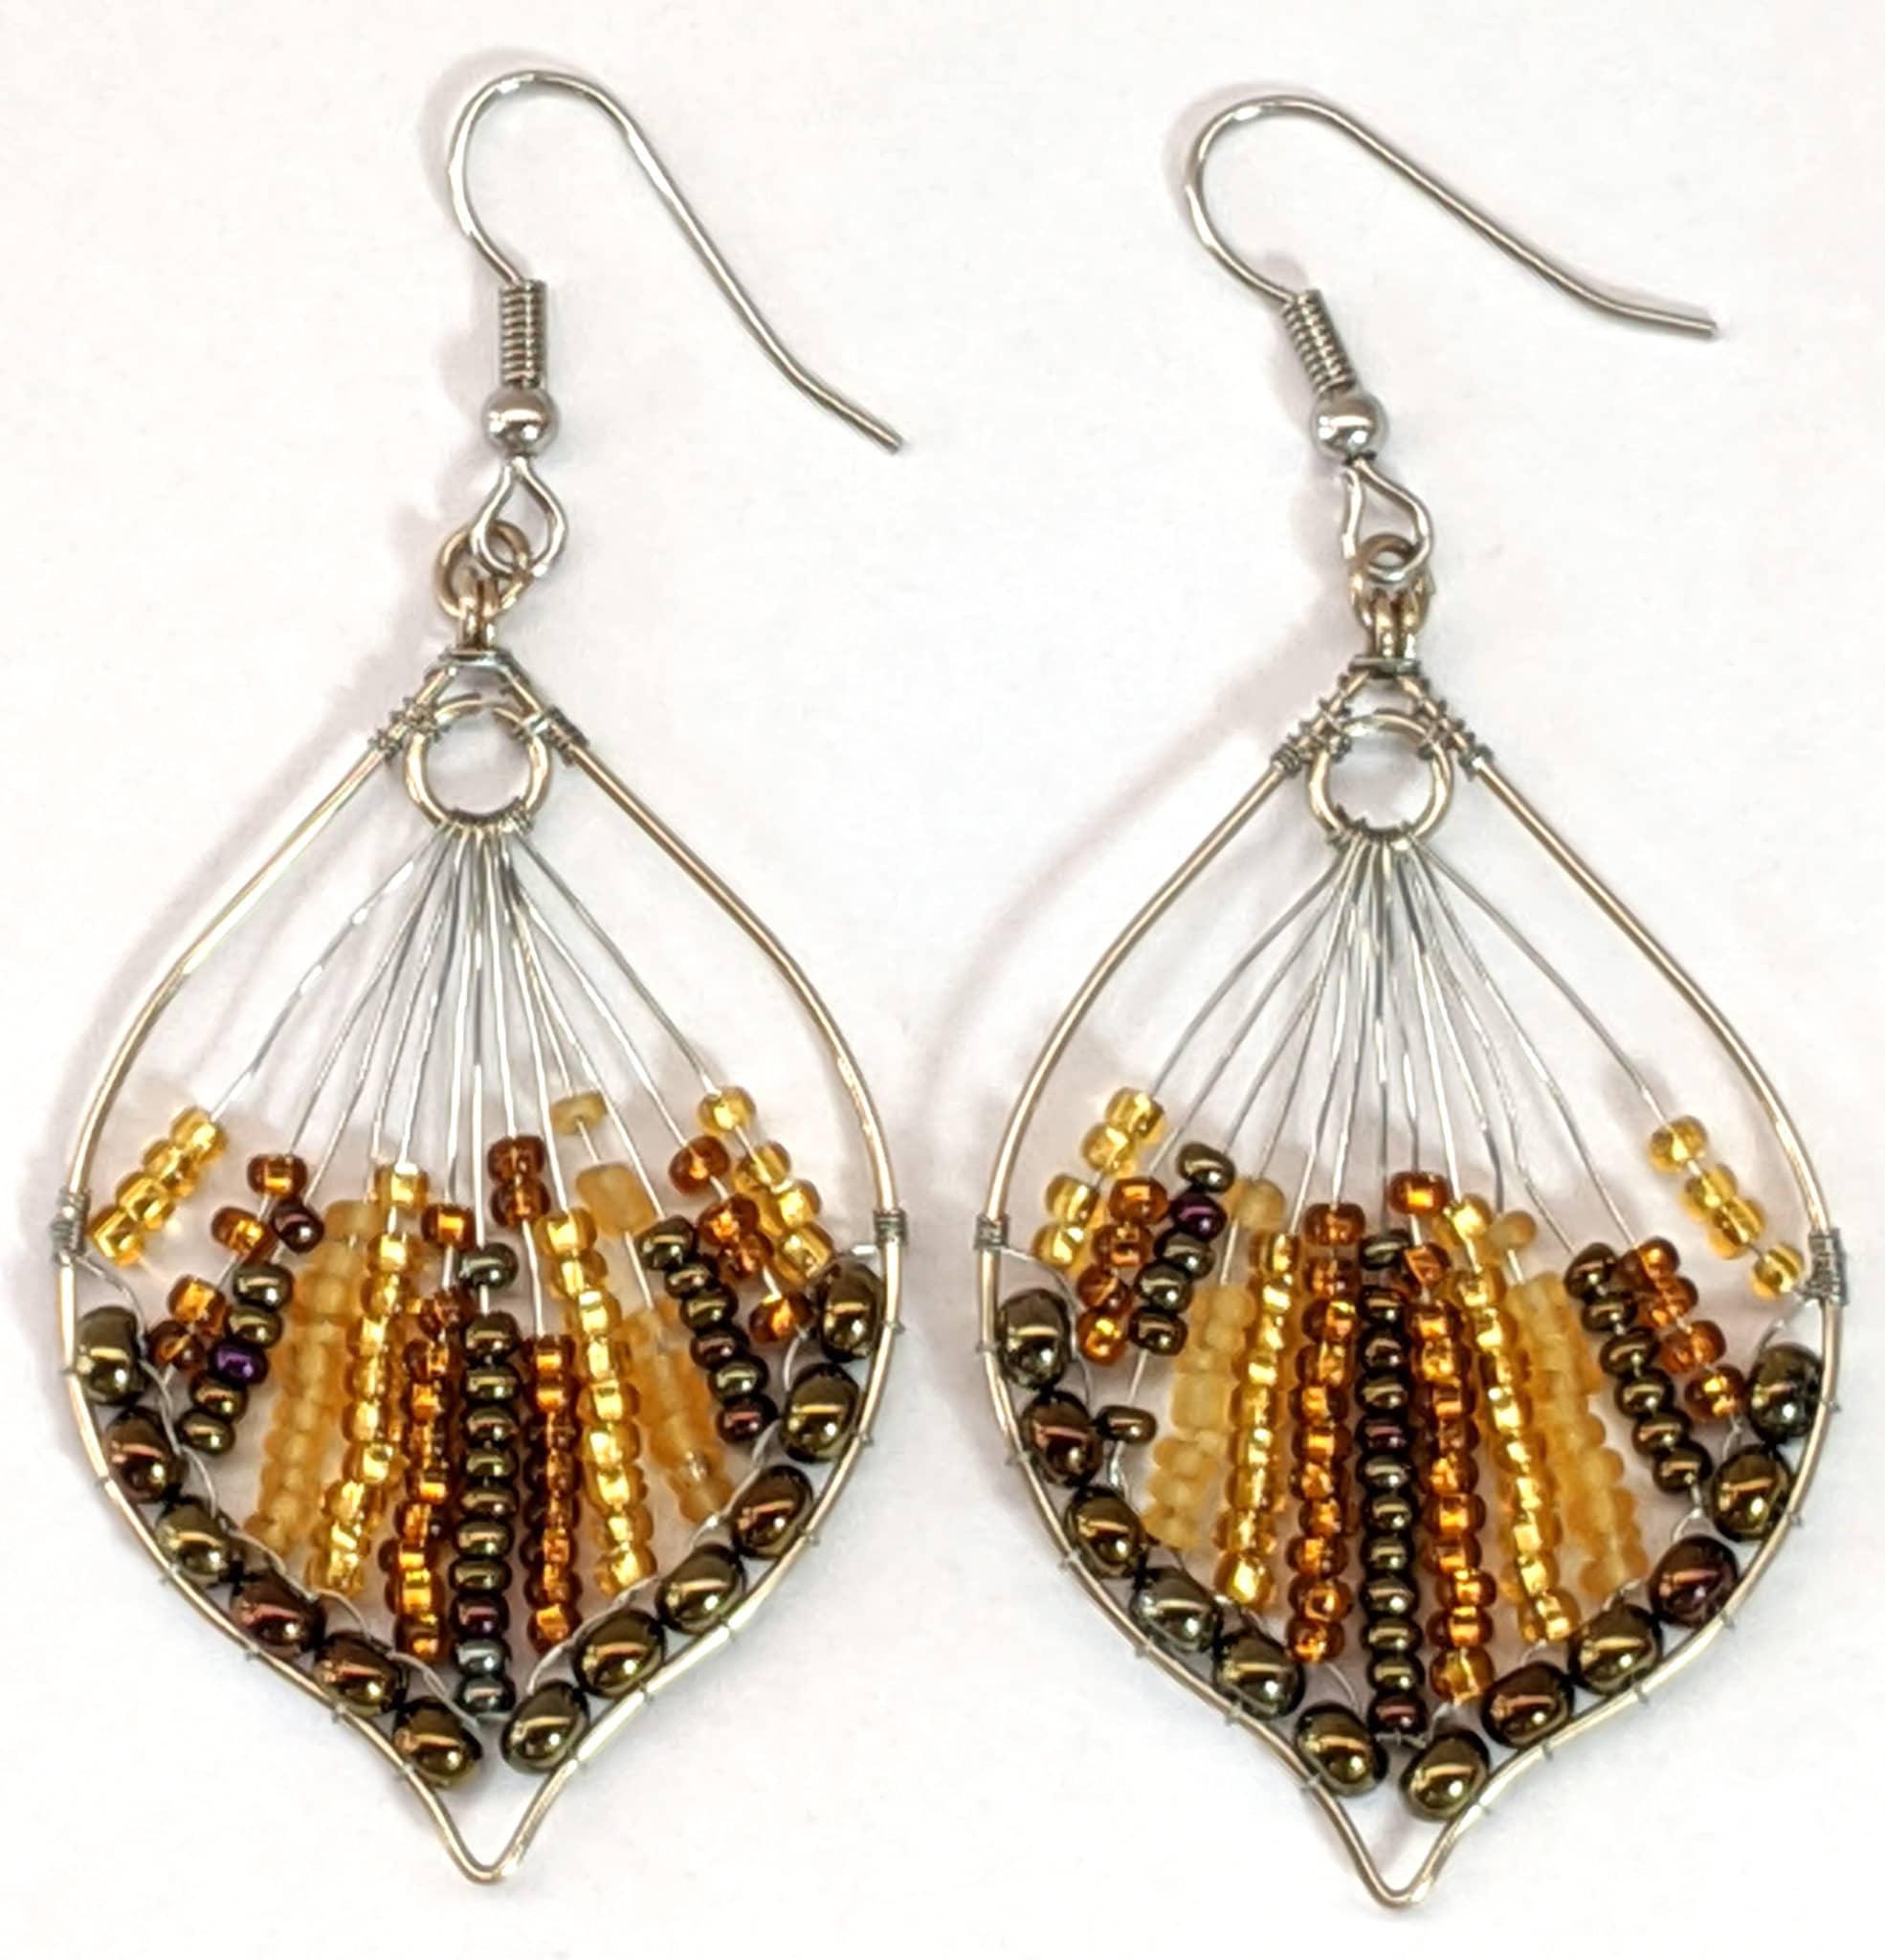 Peacock Tail Beaded Earrings - Golds